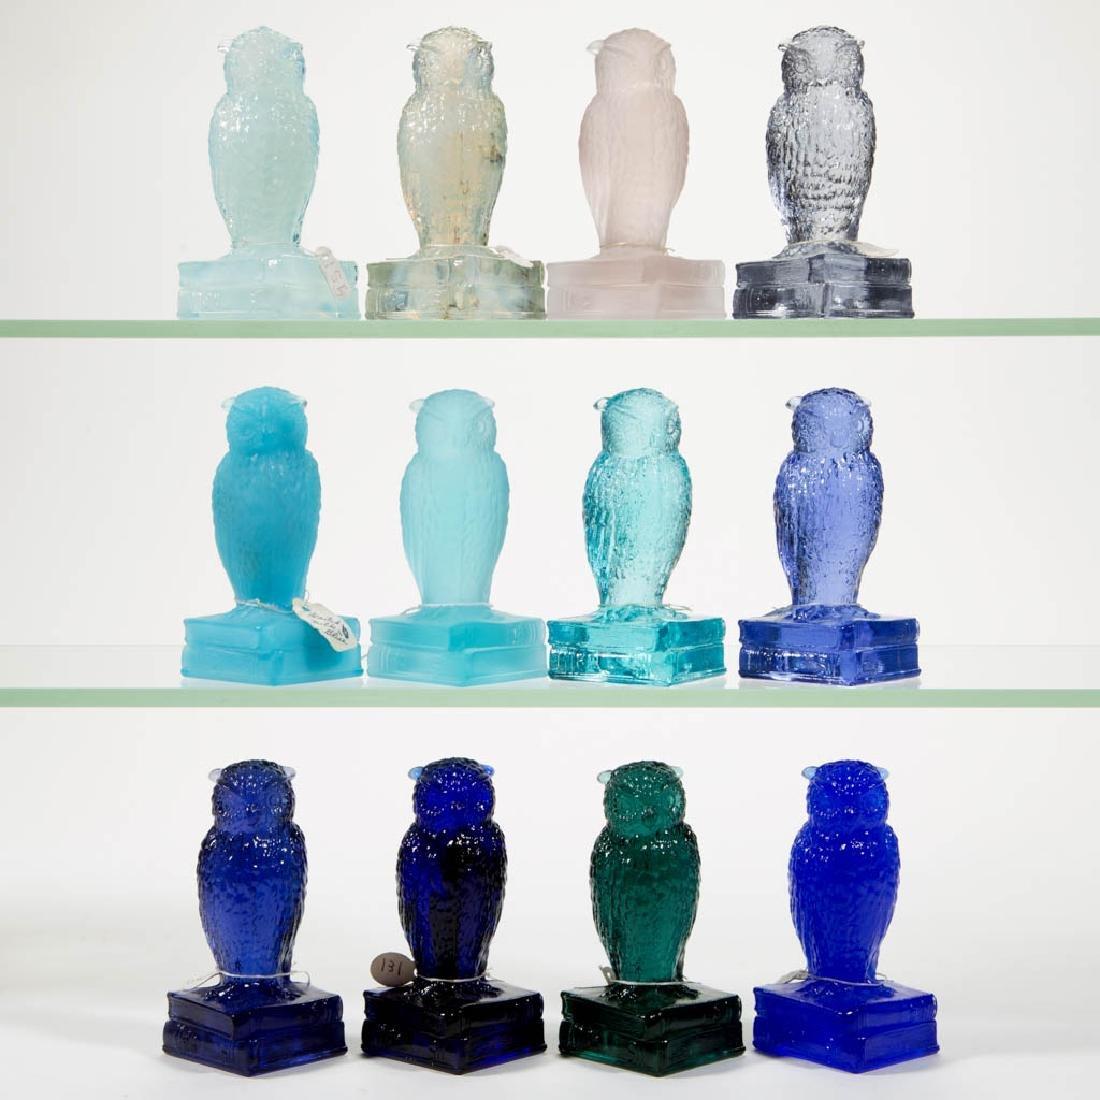 DEGENHART GLASS OWL FIGURES, LOT OF 12